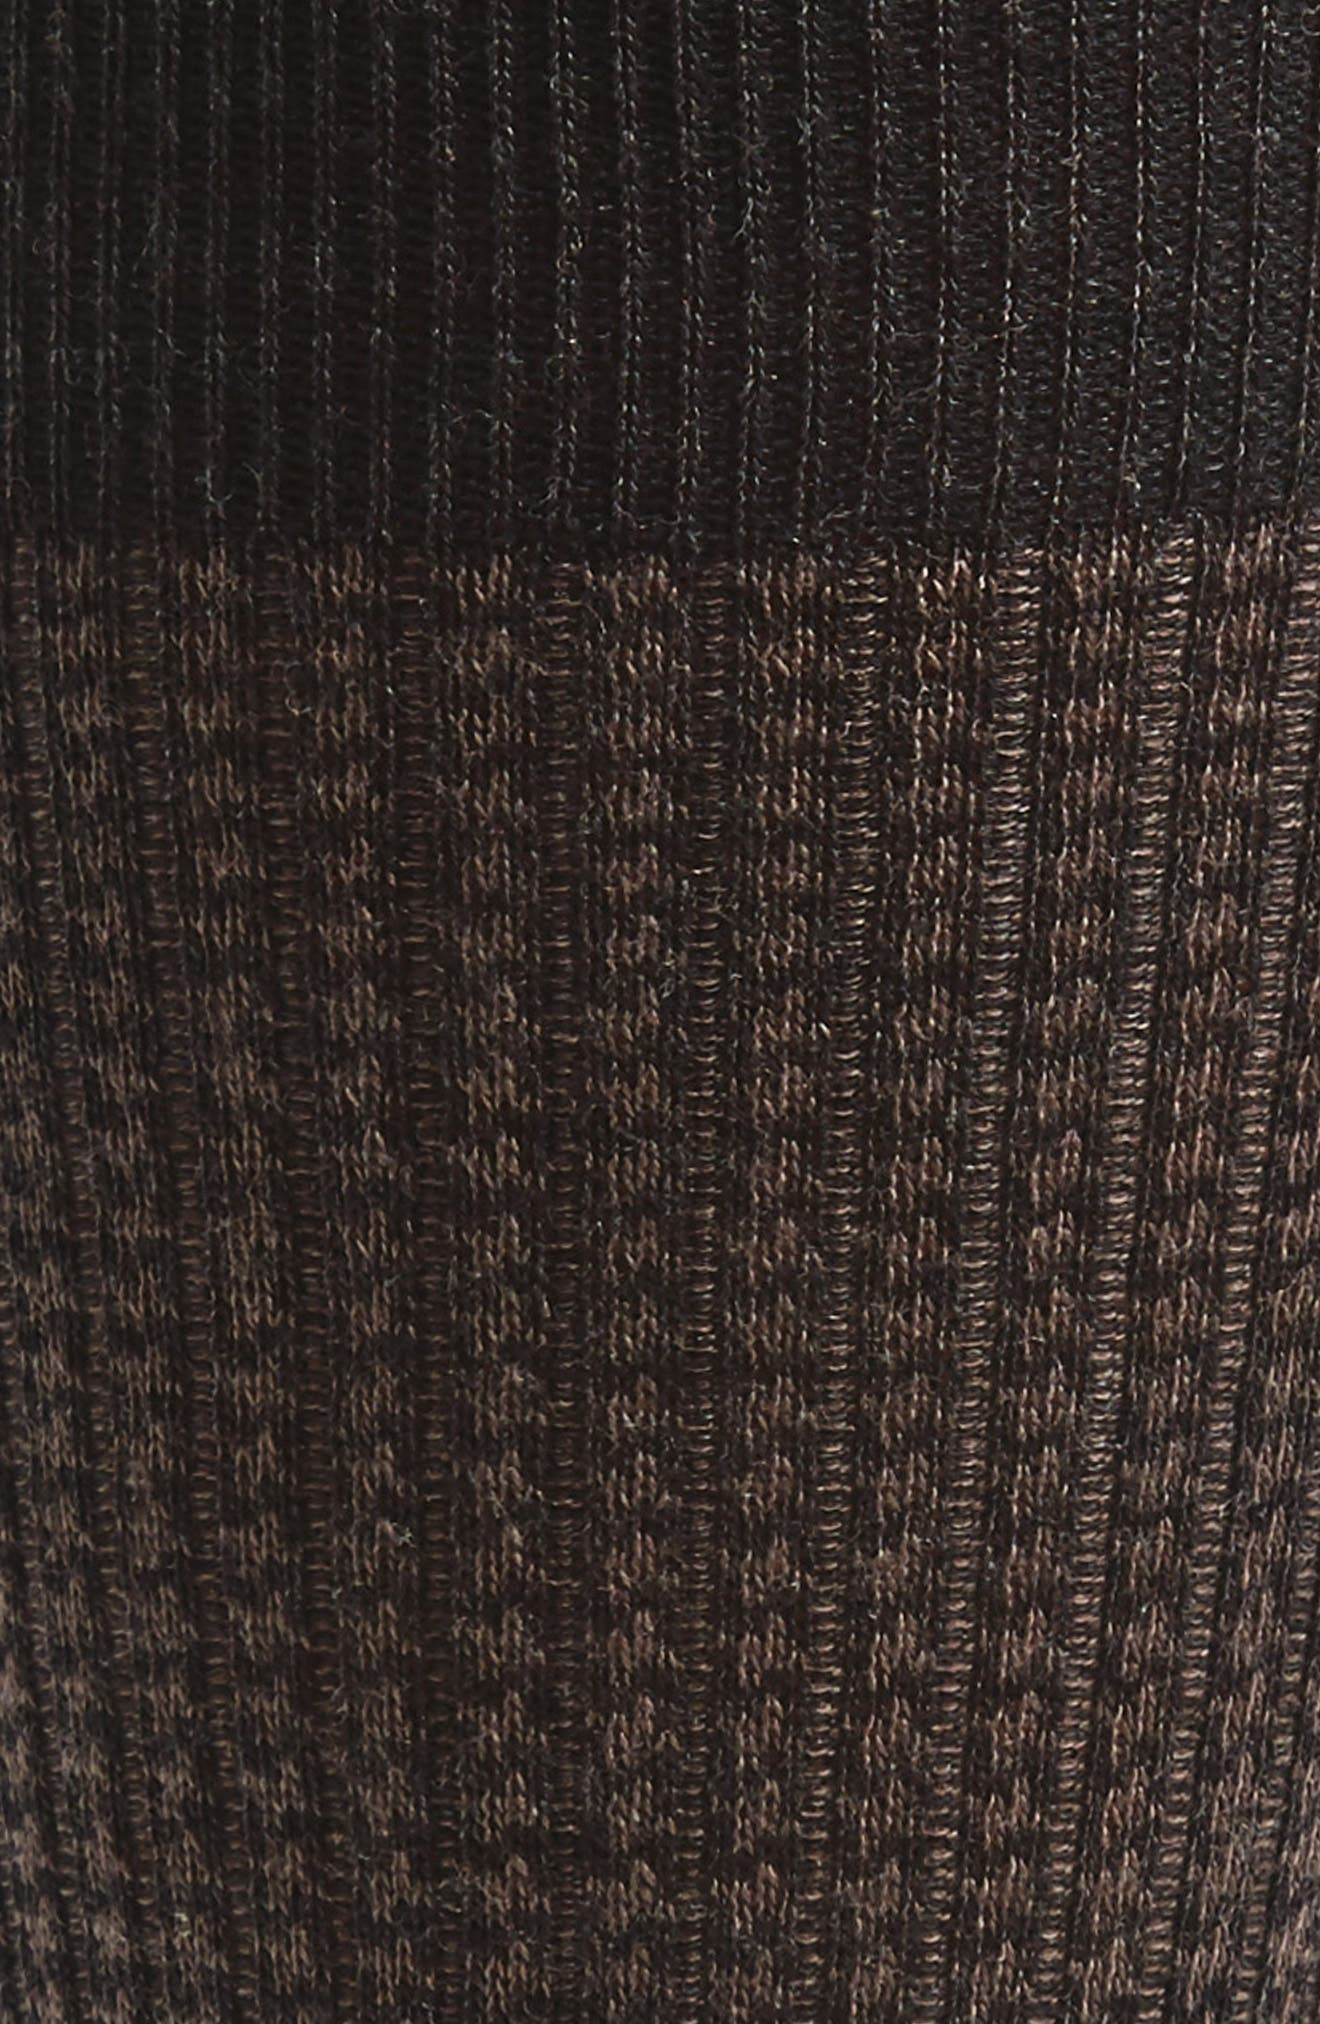 Houndstooth Wool Blend Socks,                             Alternate thumbnail 2, color,                             021